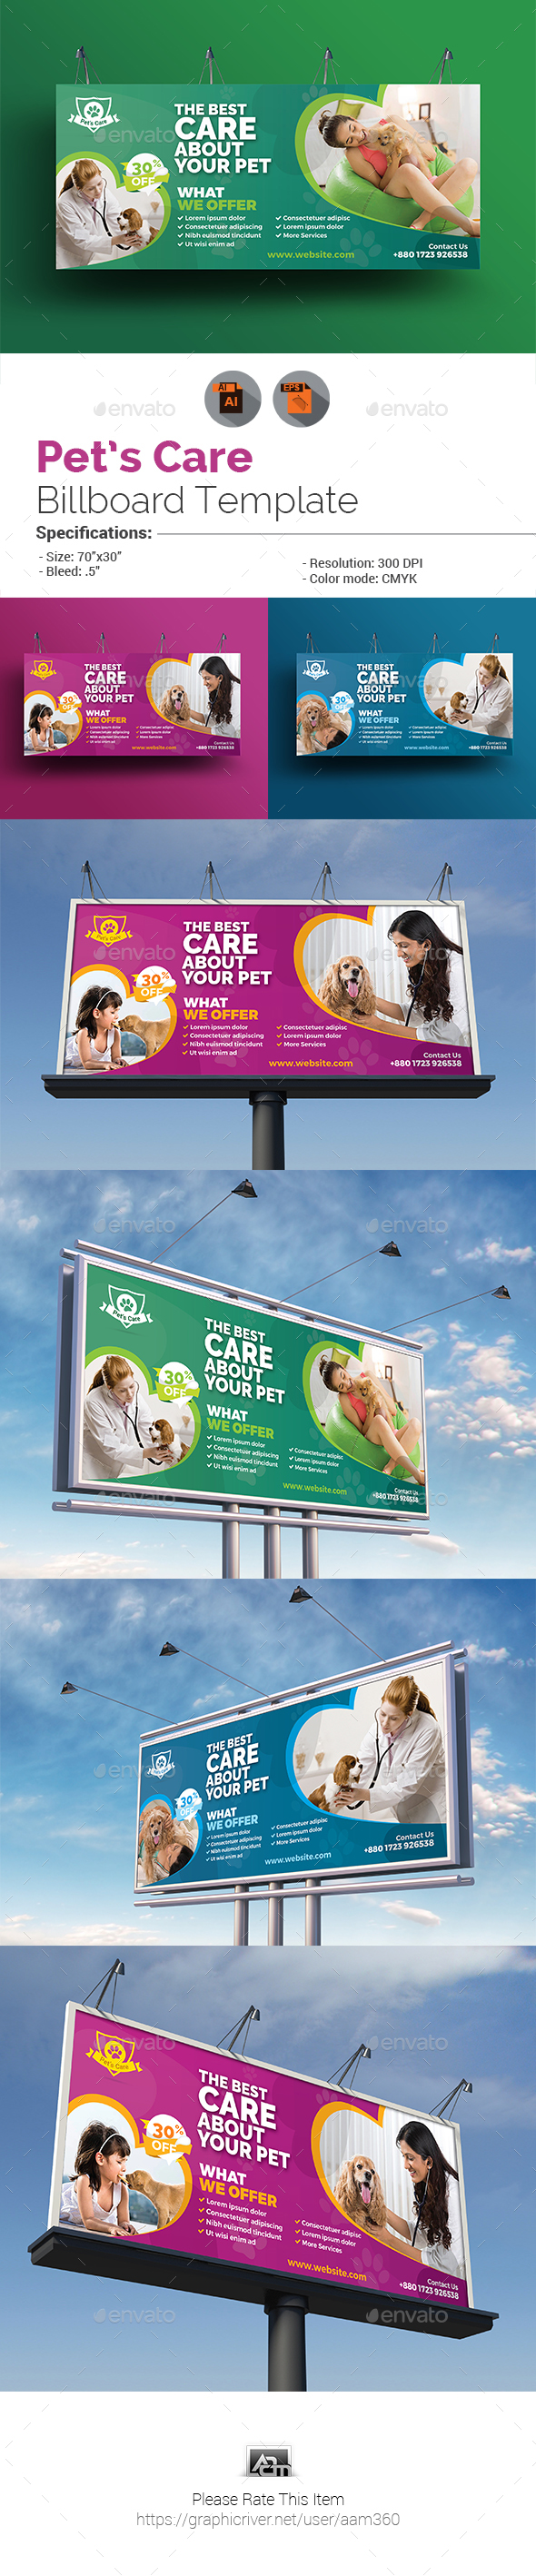 Pets Care Billboard Template - Signage Print Templates